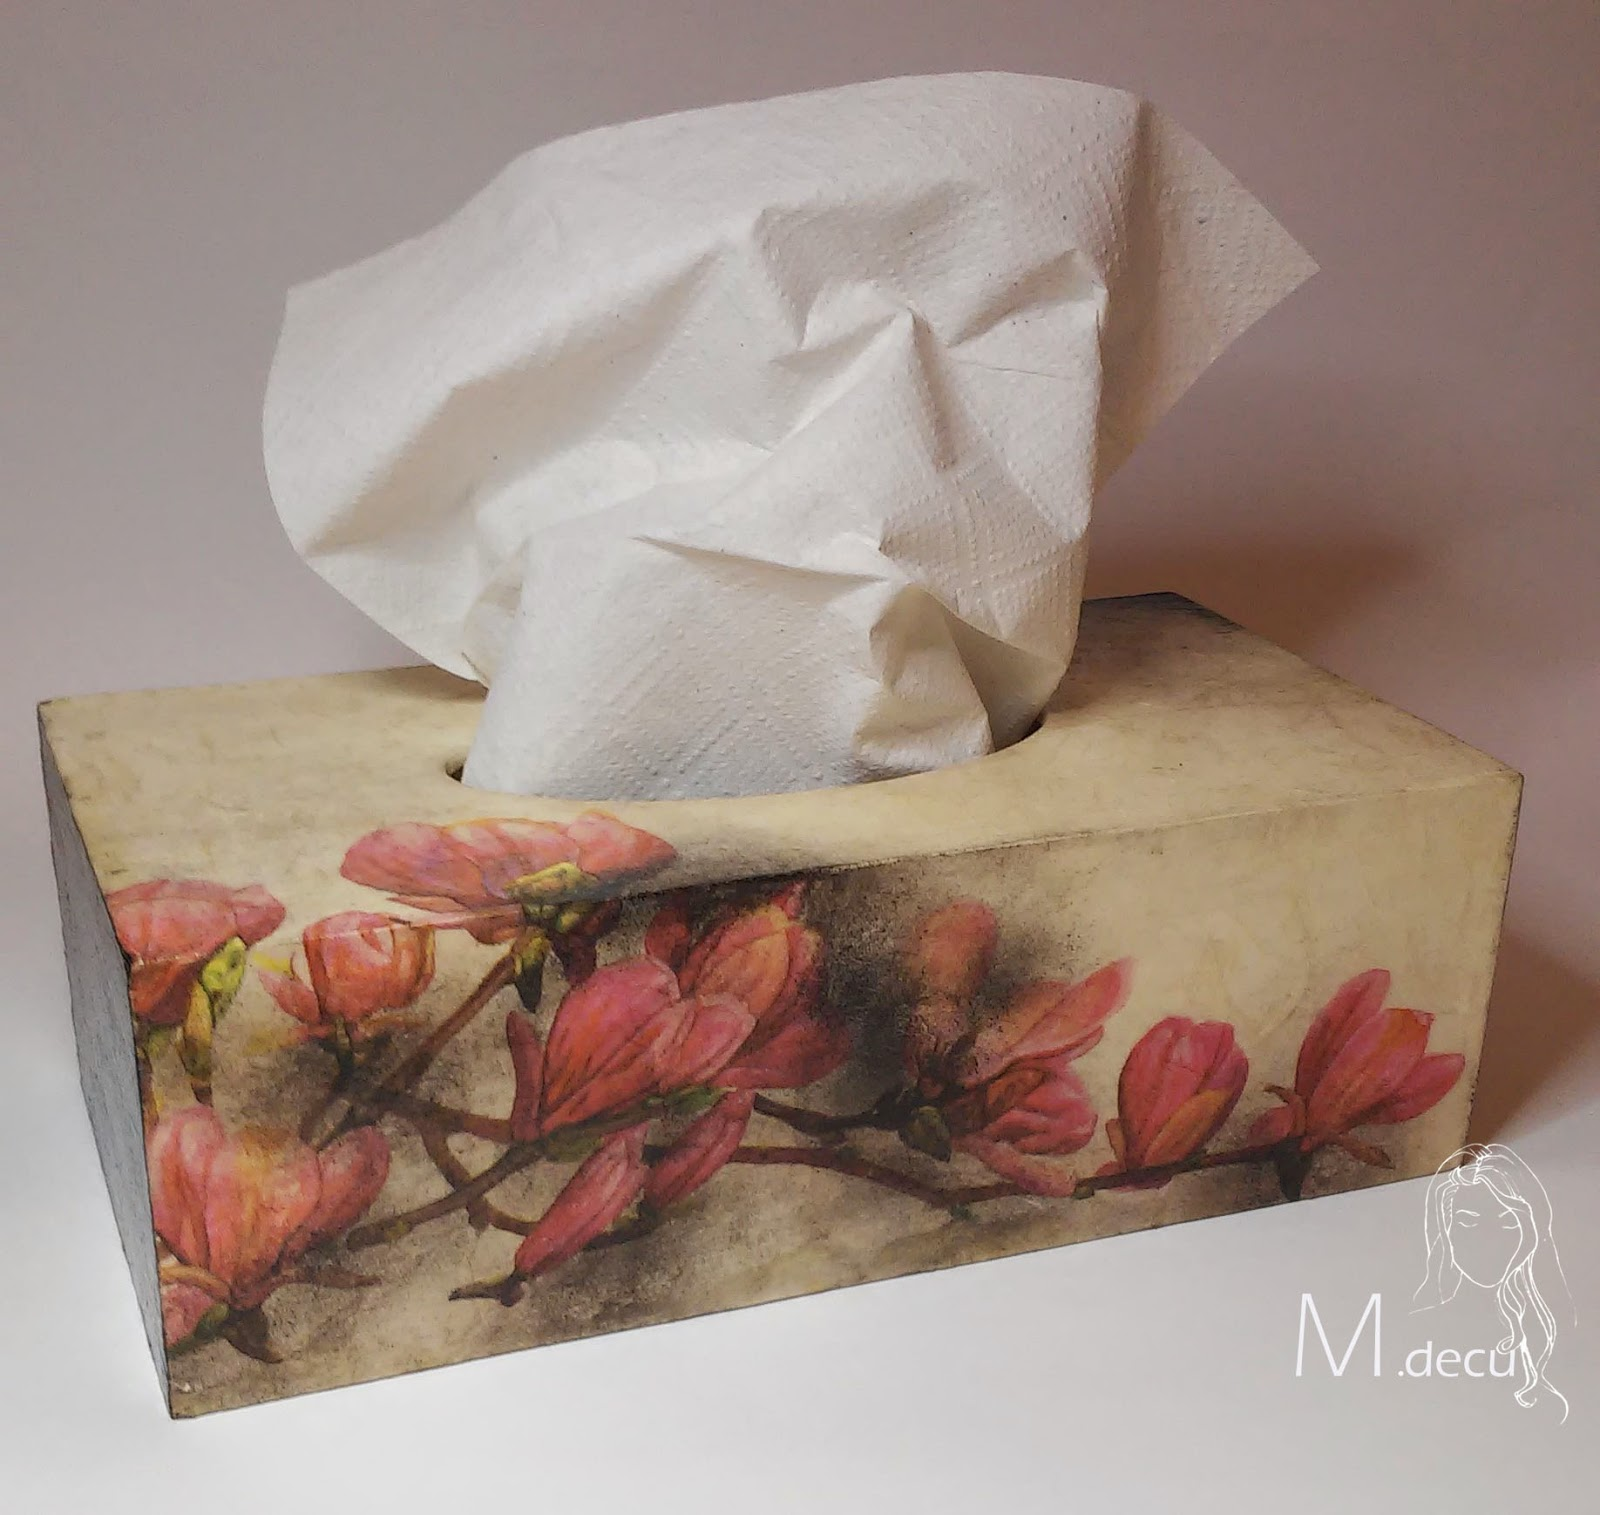 http://mdecu.blogspot.com/2014/12/chustecznik-z-magnolia-tissue-box-with.html